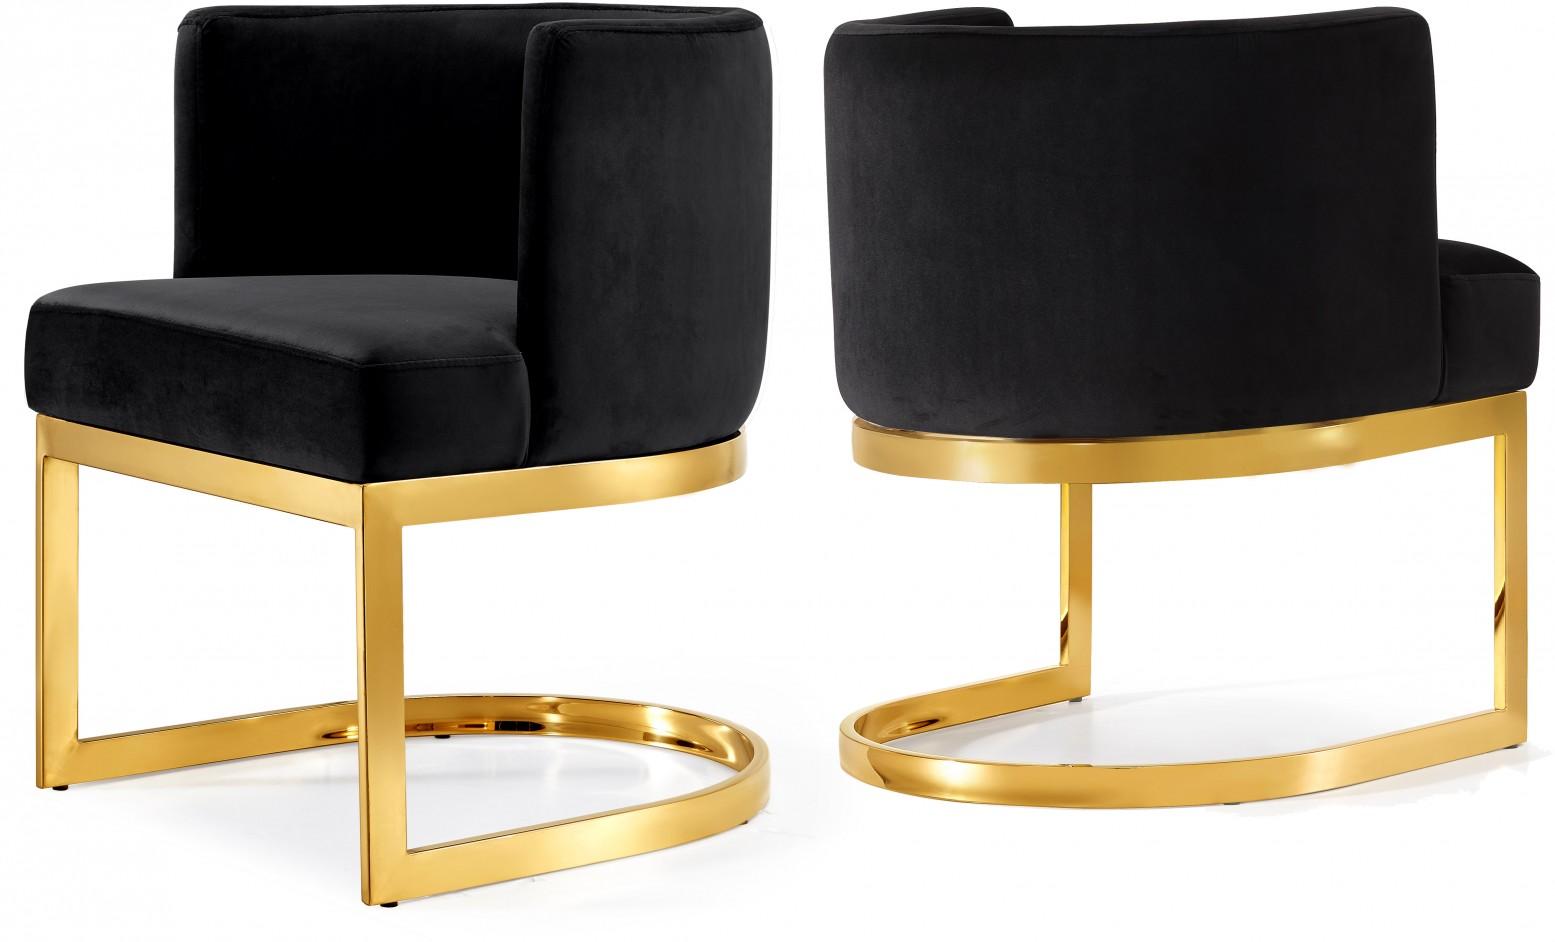 Awesome Gianna Velvet Dining Chair Black Gold Legs Beatyapartments Chair Design Images Beatyapartmentscom